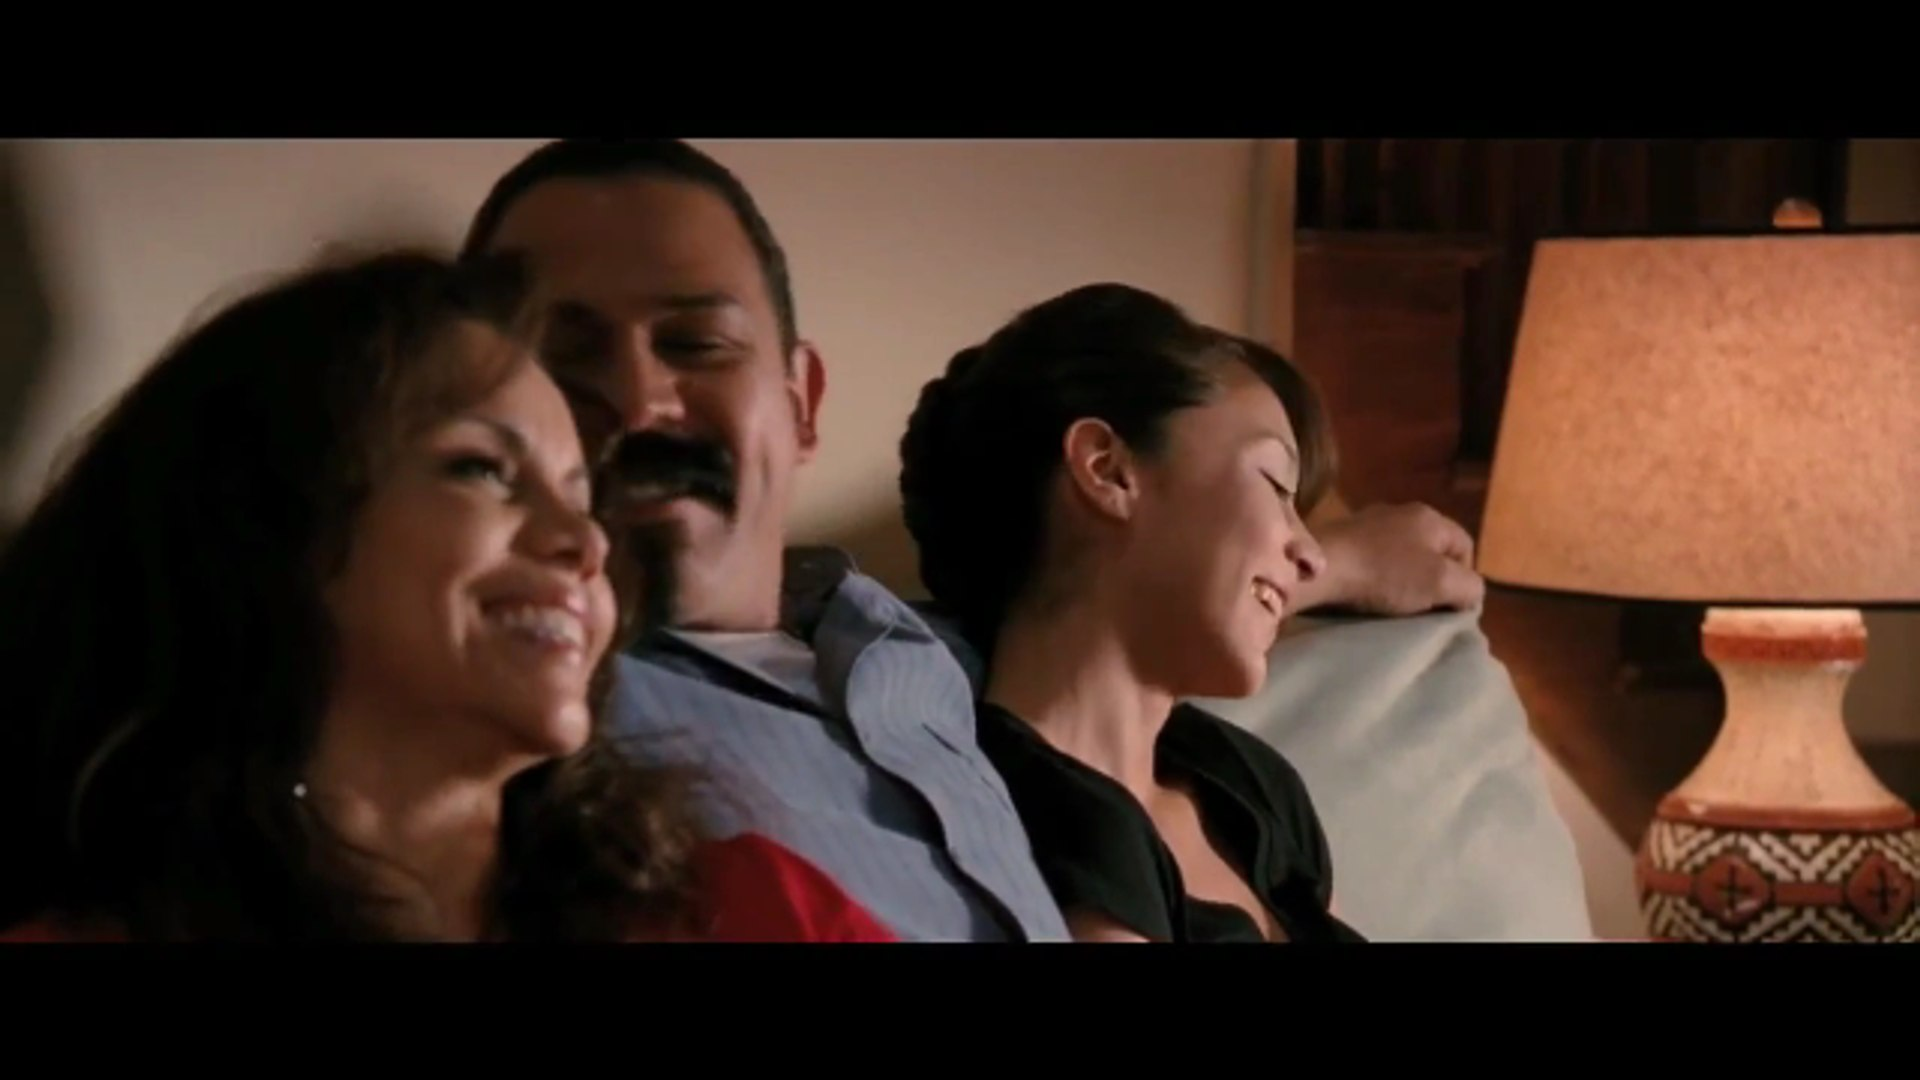 The Obama Effect (2012) - Trailer (Comedy, Drama)